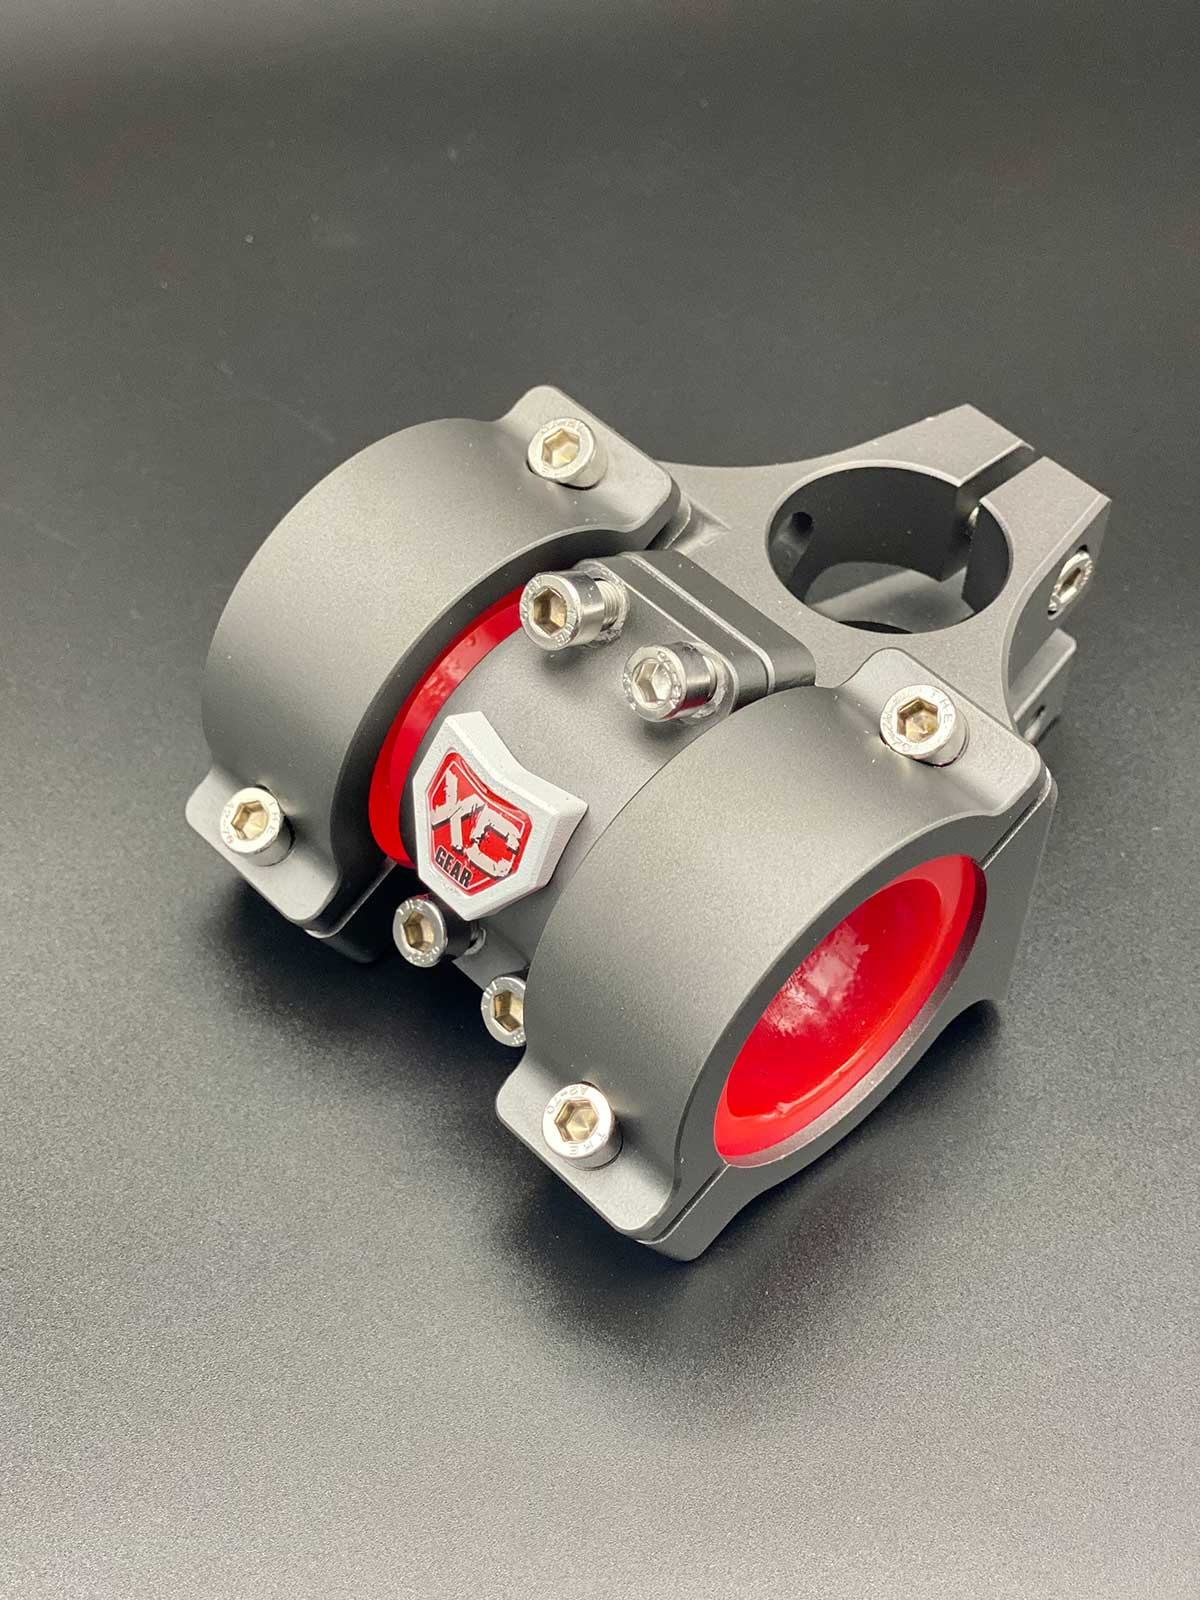 xc gear hammerhead 360 vibration damping mtb stem